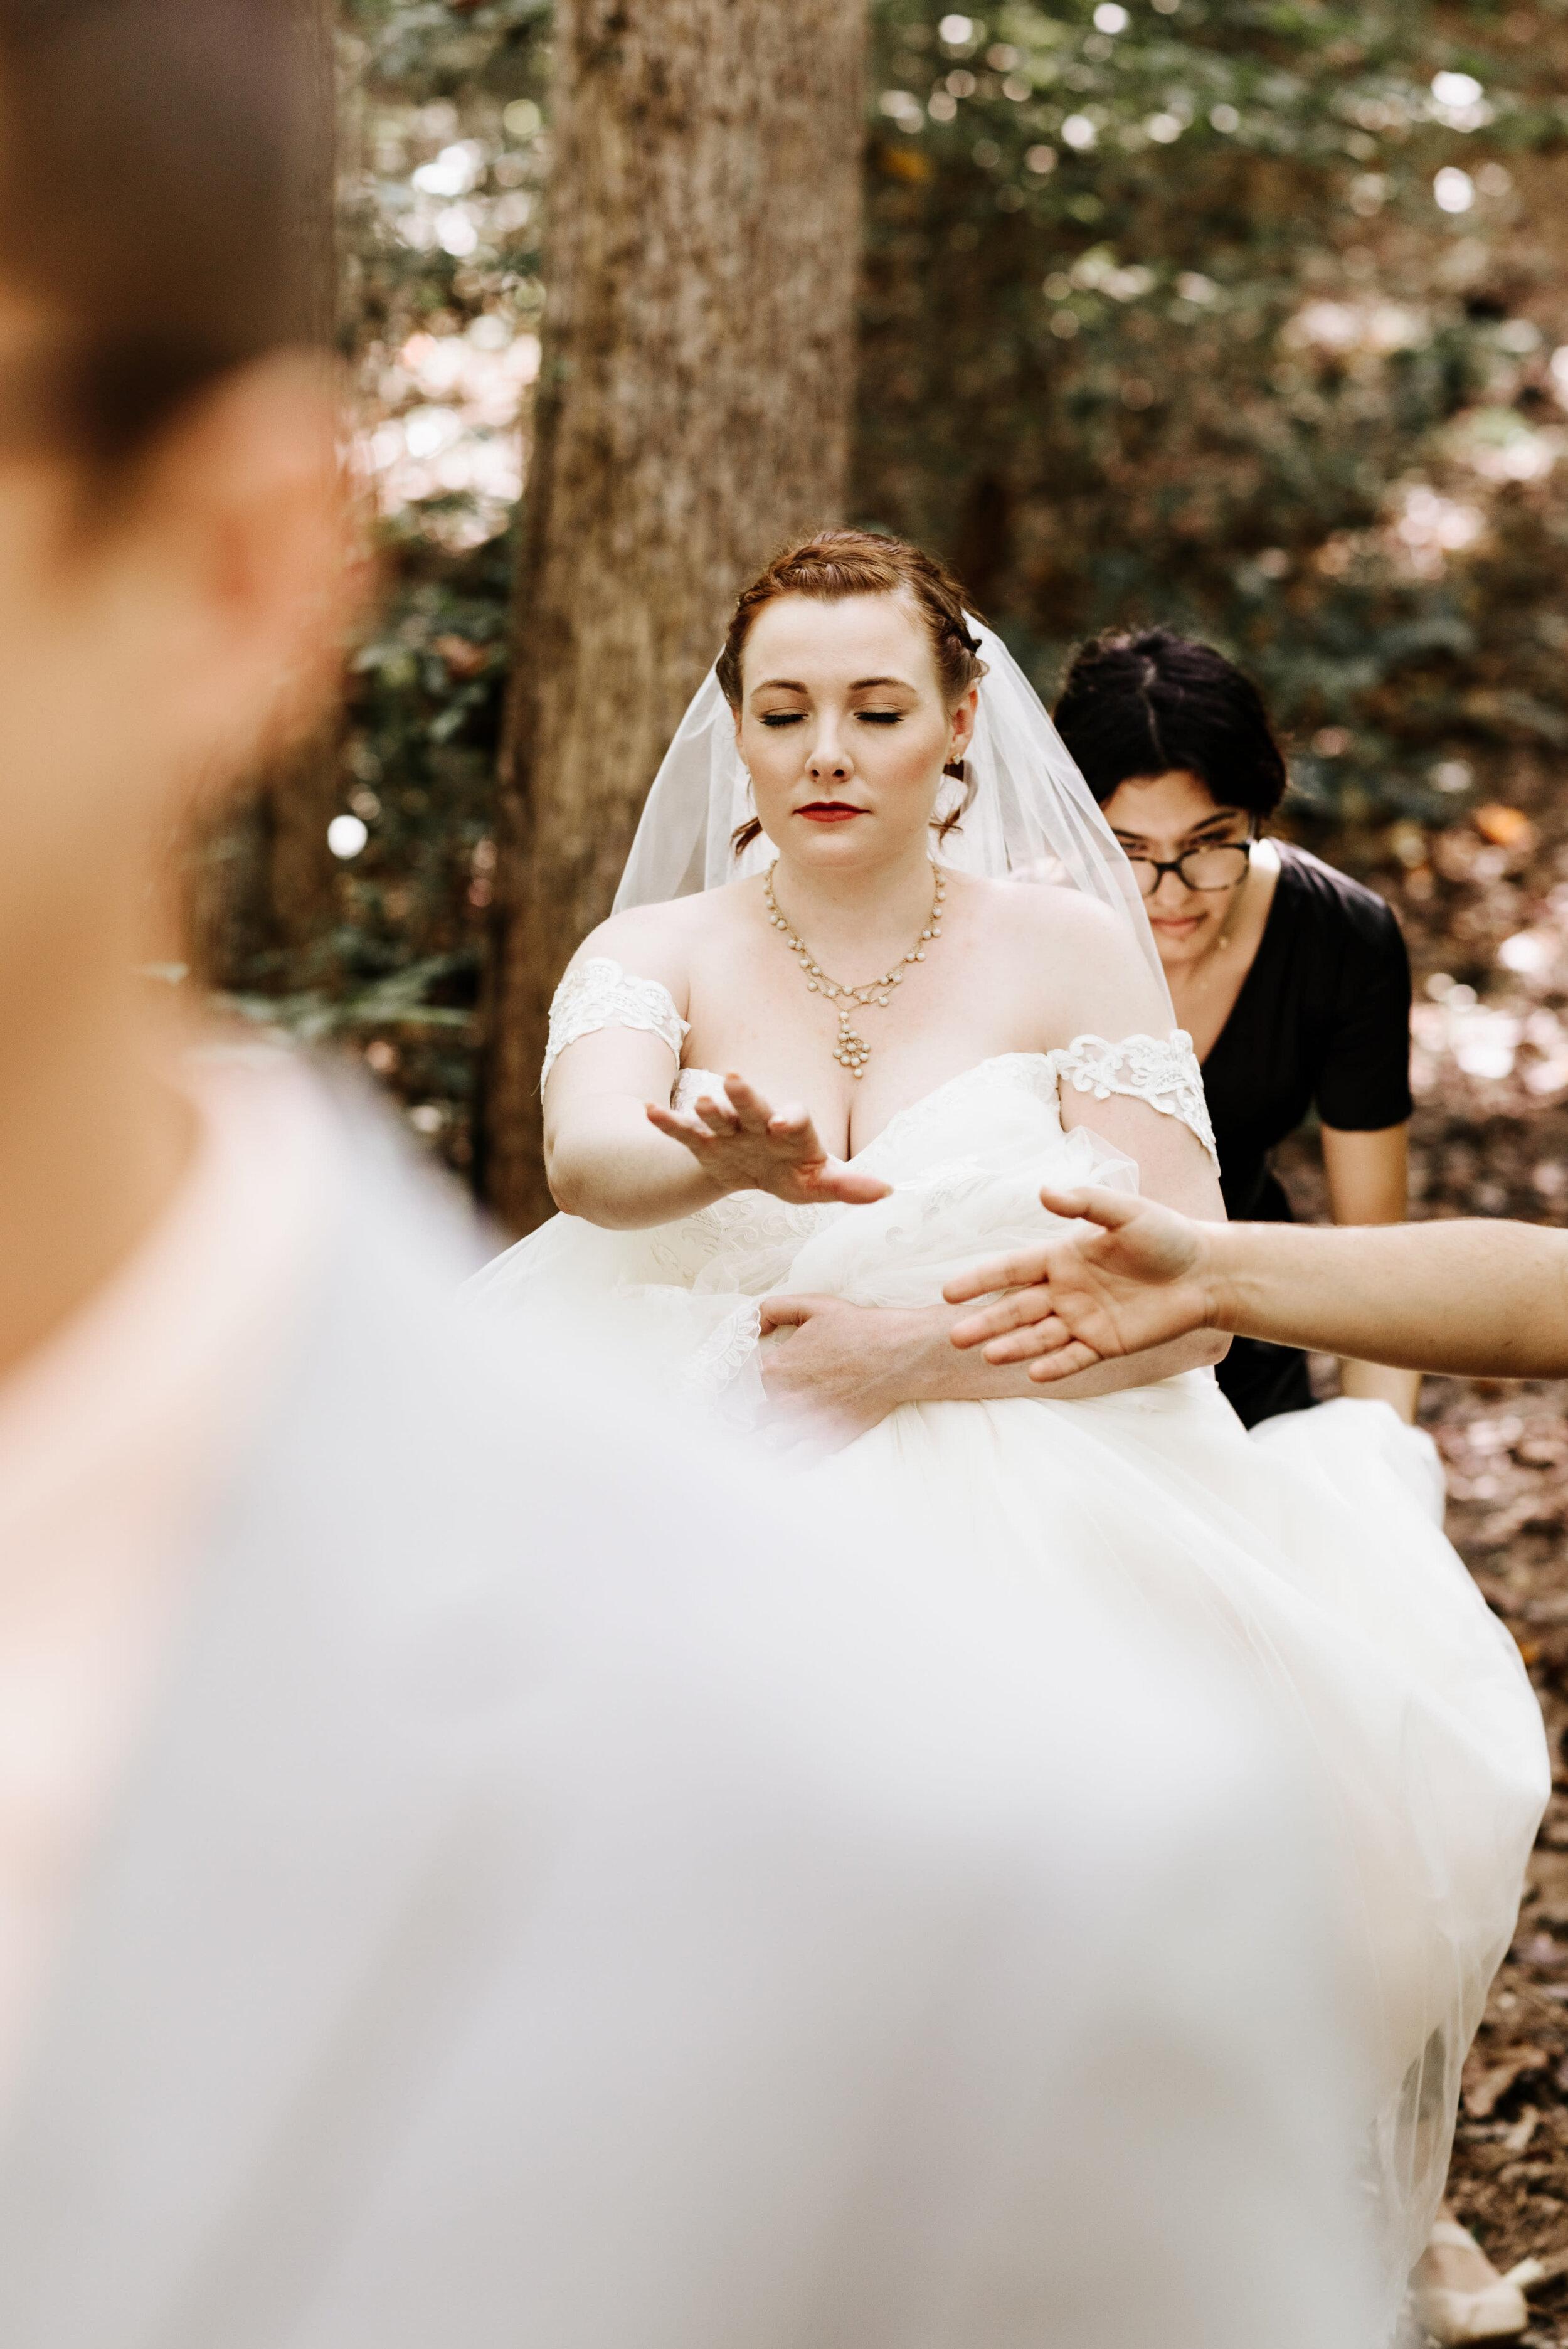 Rachel_David_Wedding_Richmond_Virginia_Photography_by_V_13.jpg